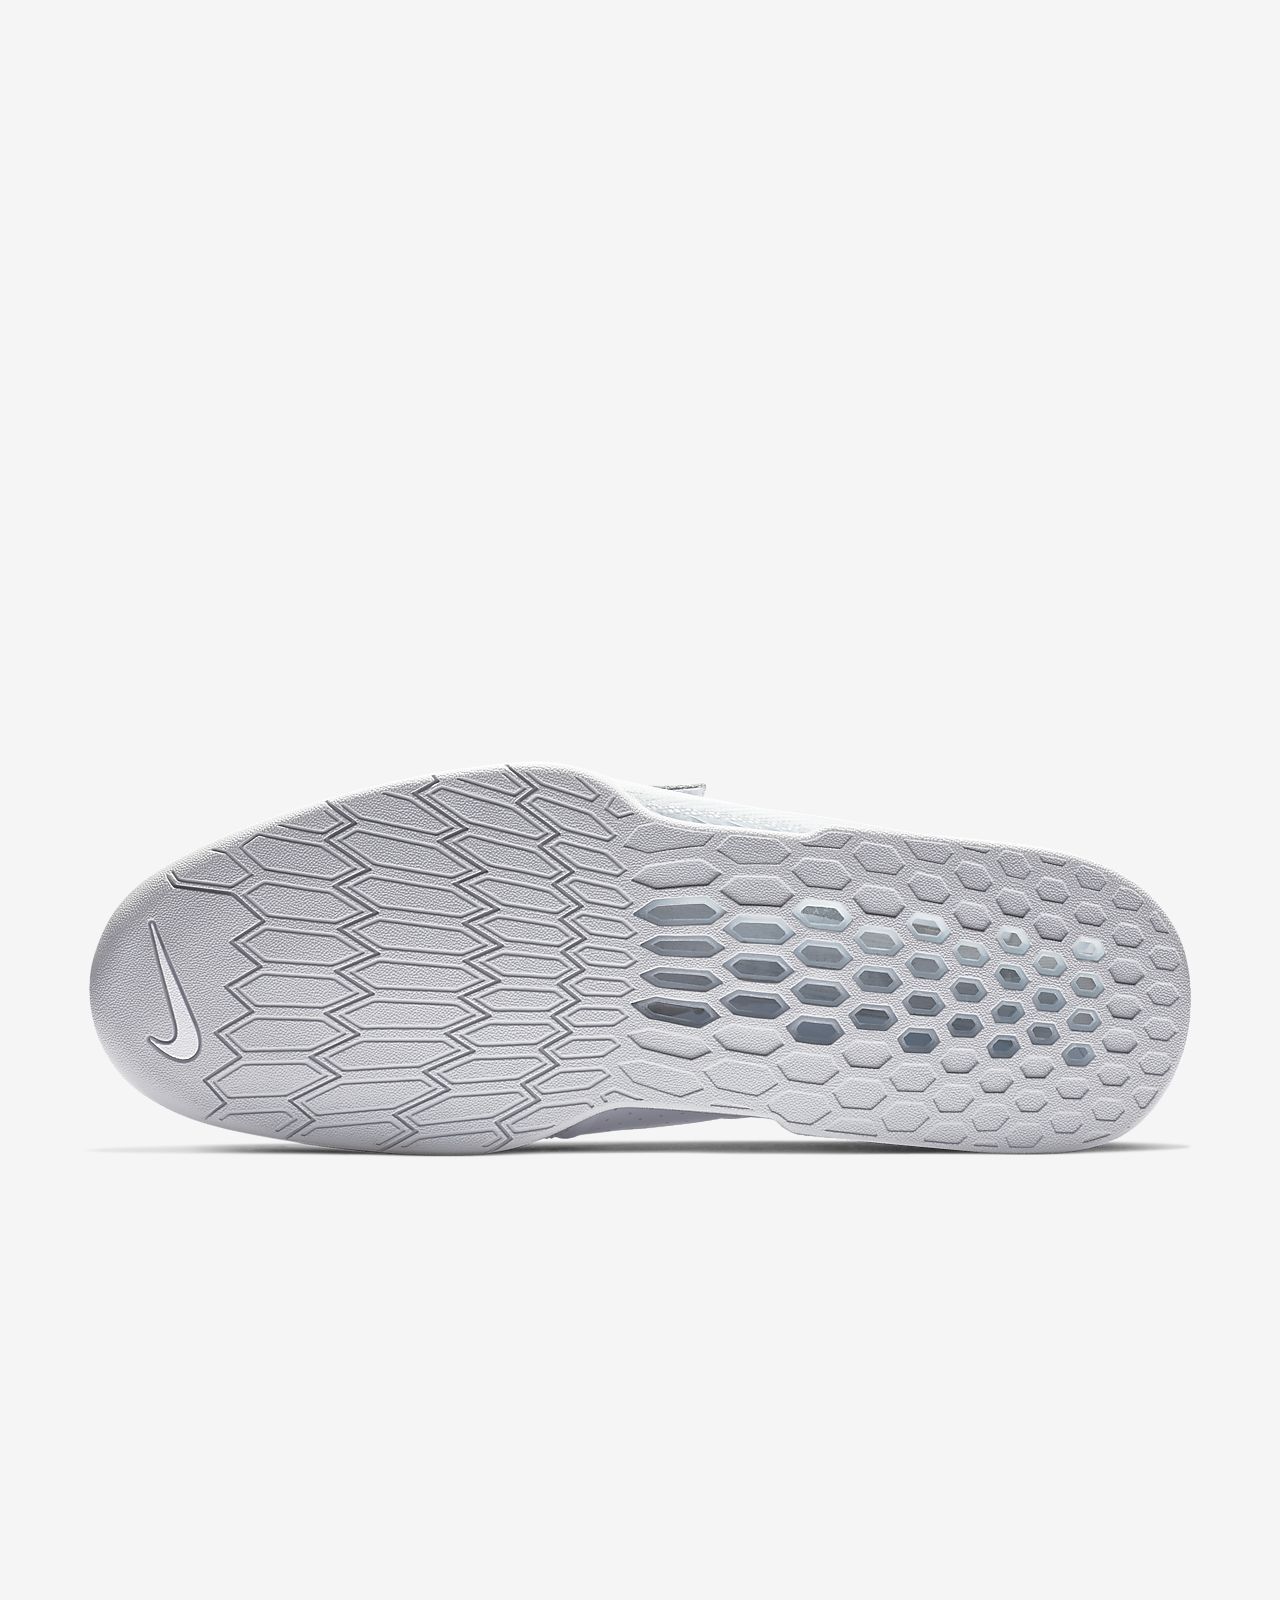 340c595e31a0 Nike Romaleos 3 XD Training Shoe. Nike.com RO